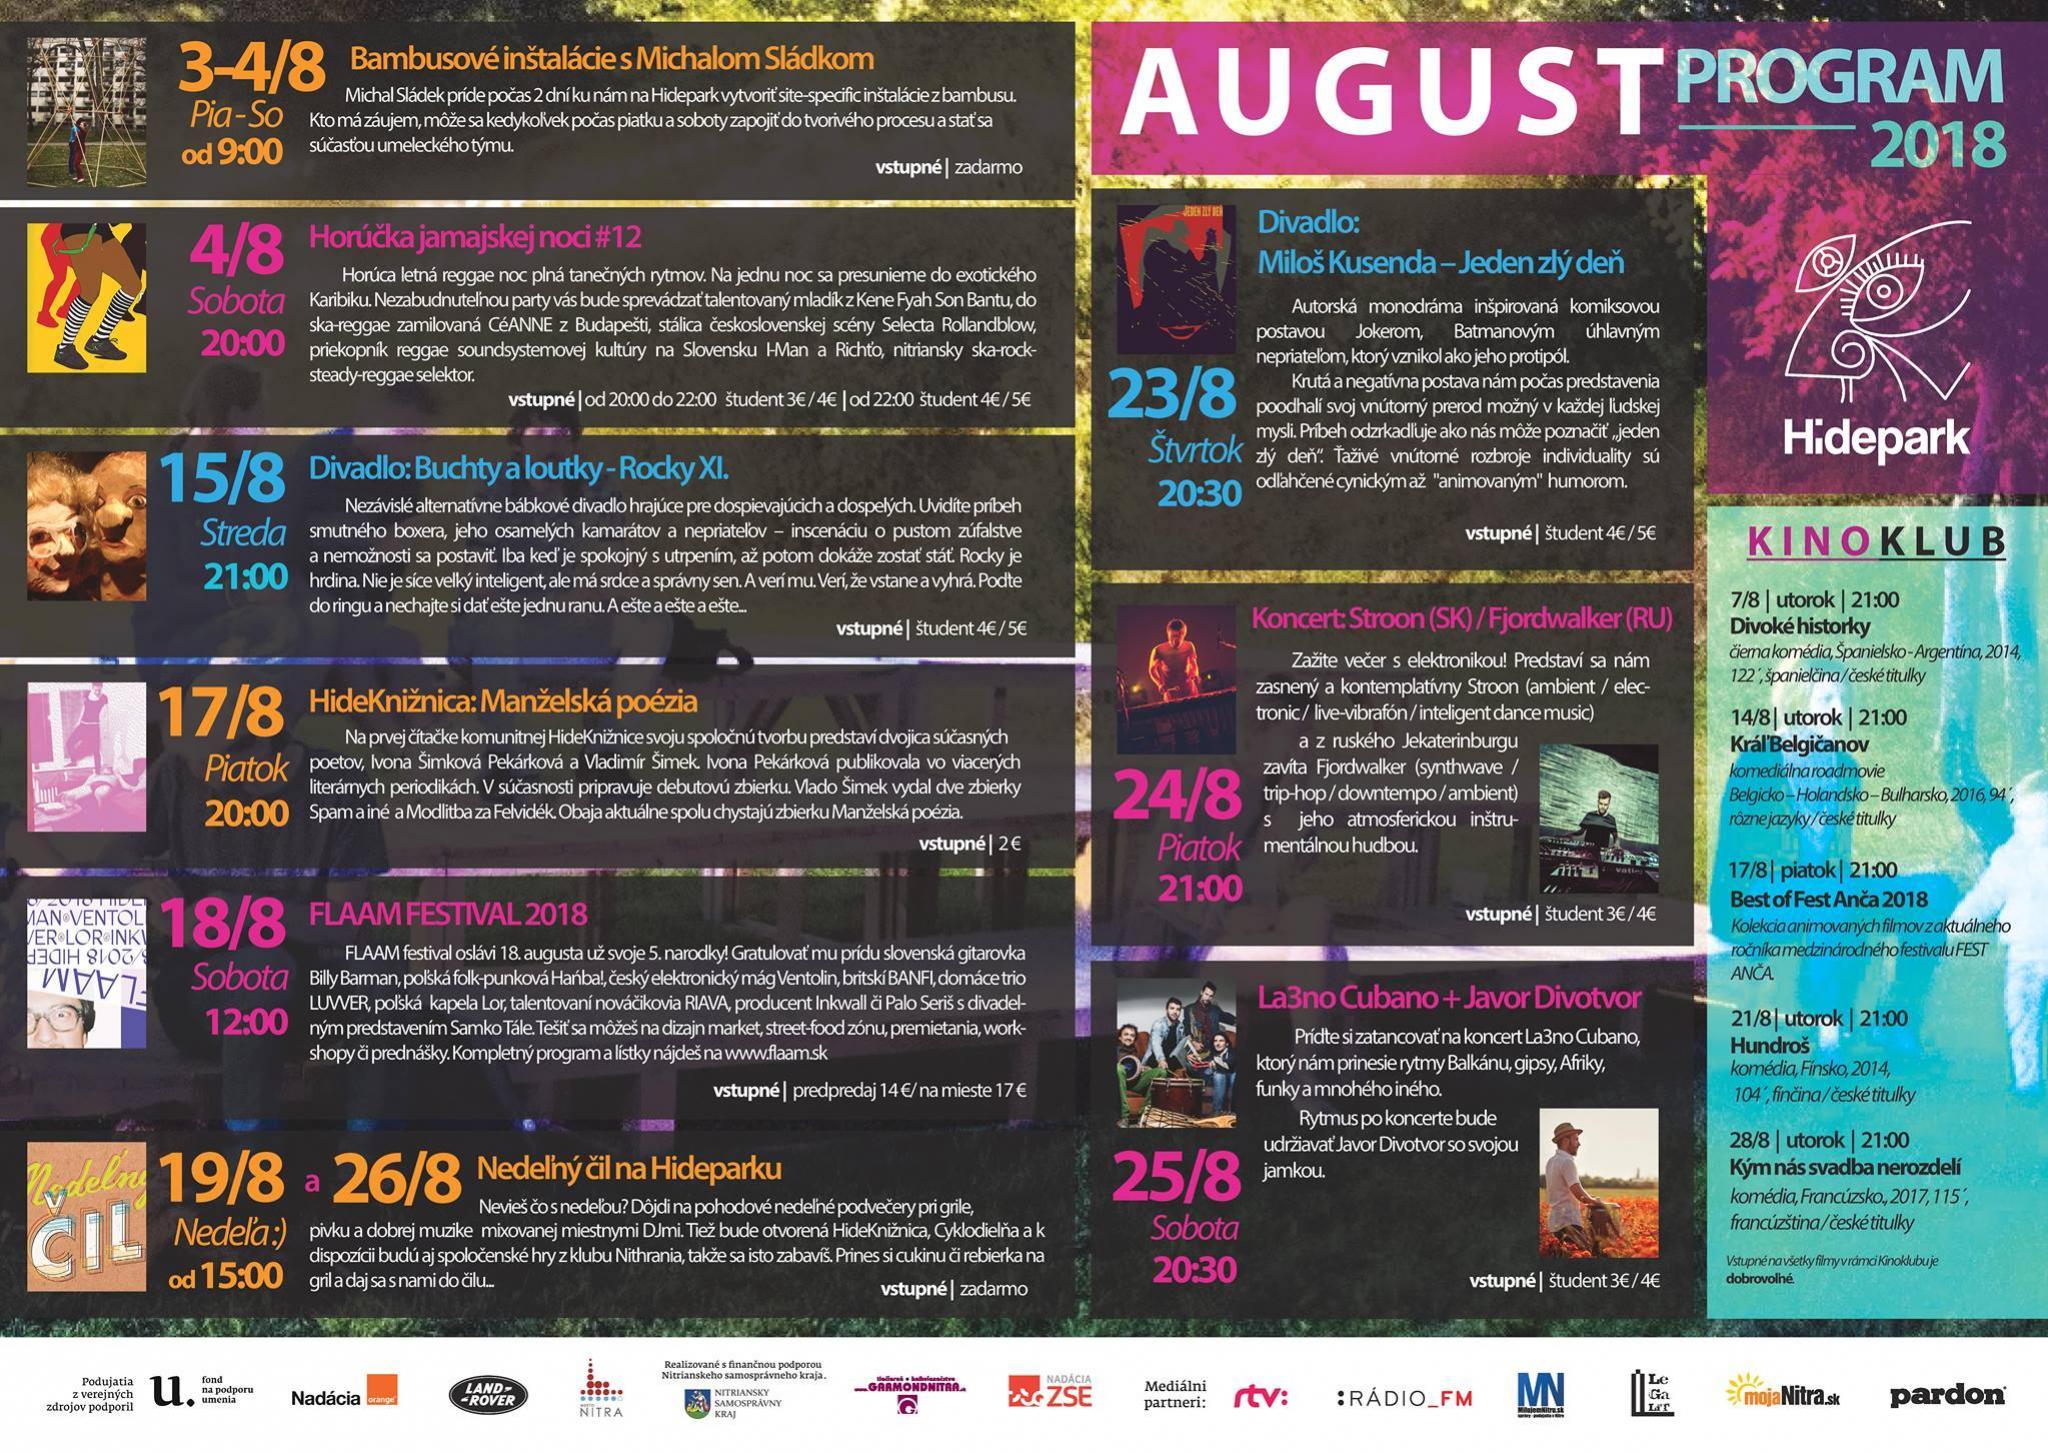 hidepark program august